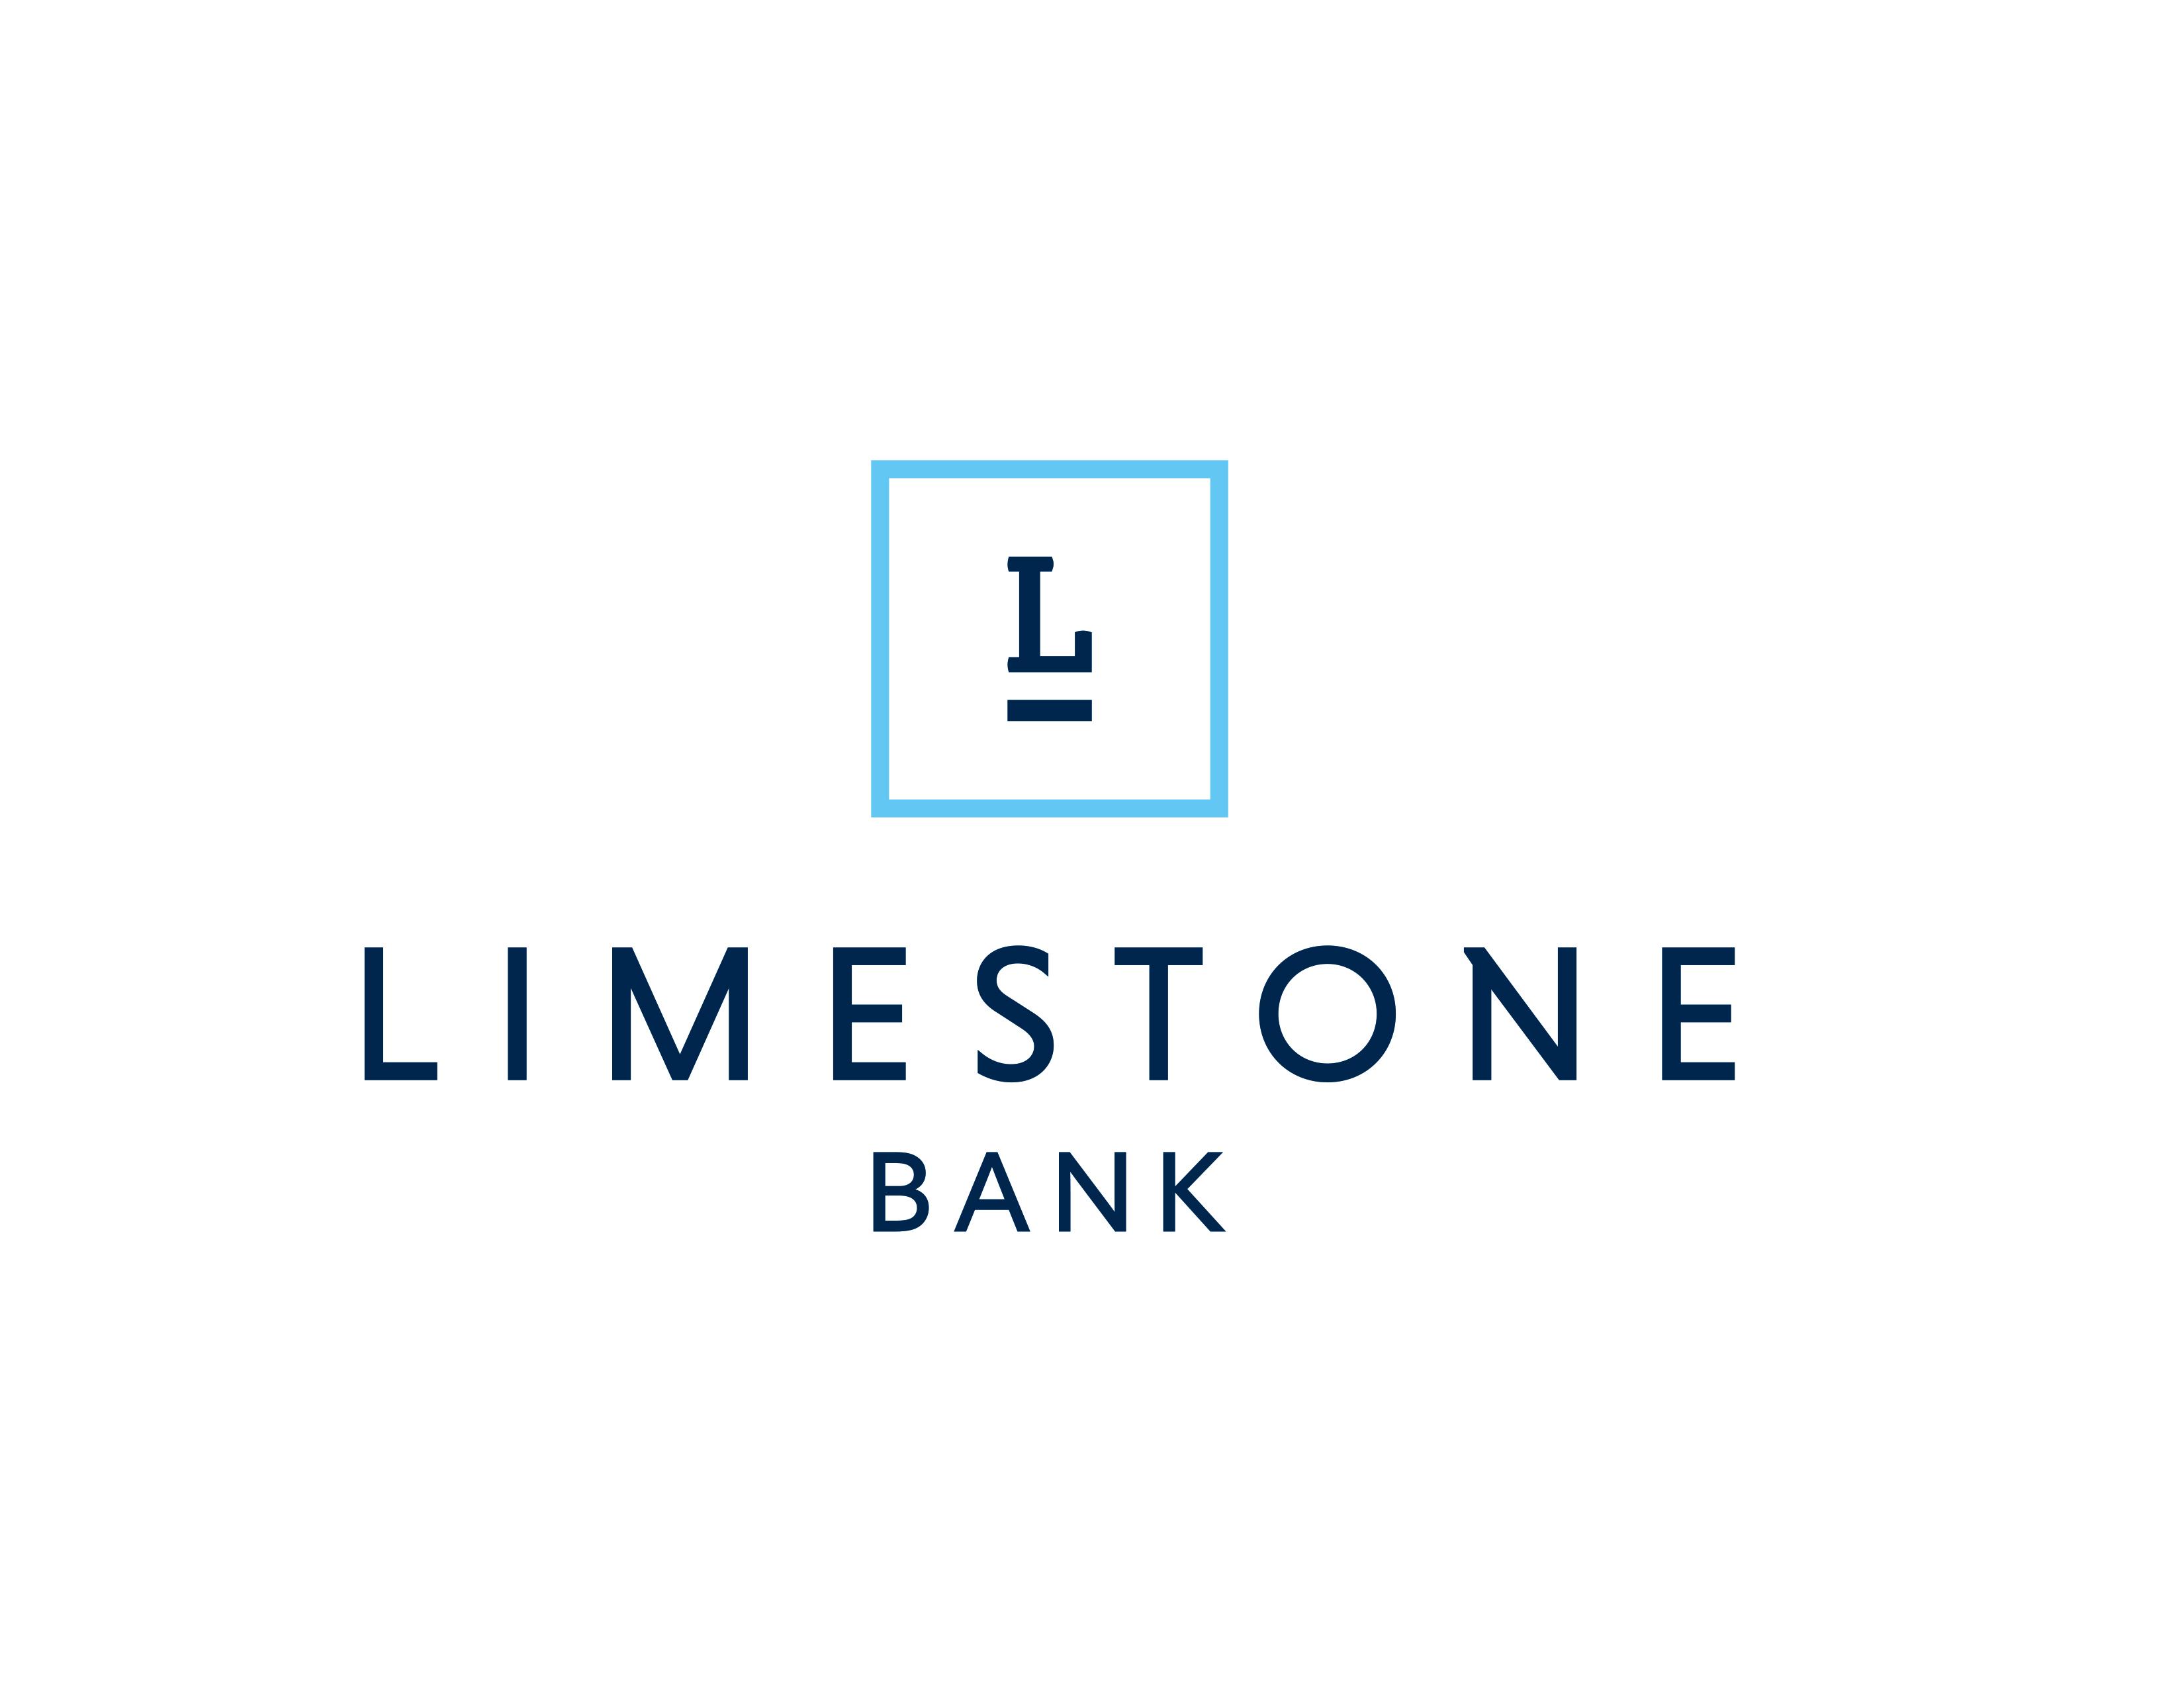 Limestone Bank